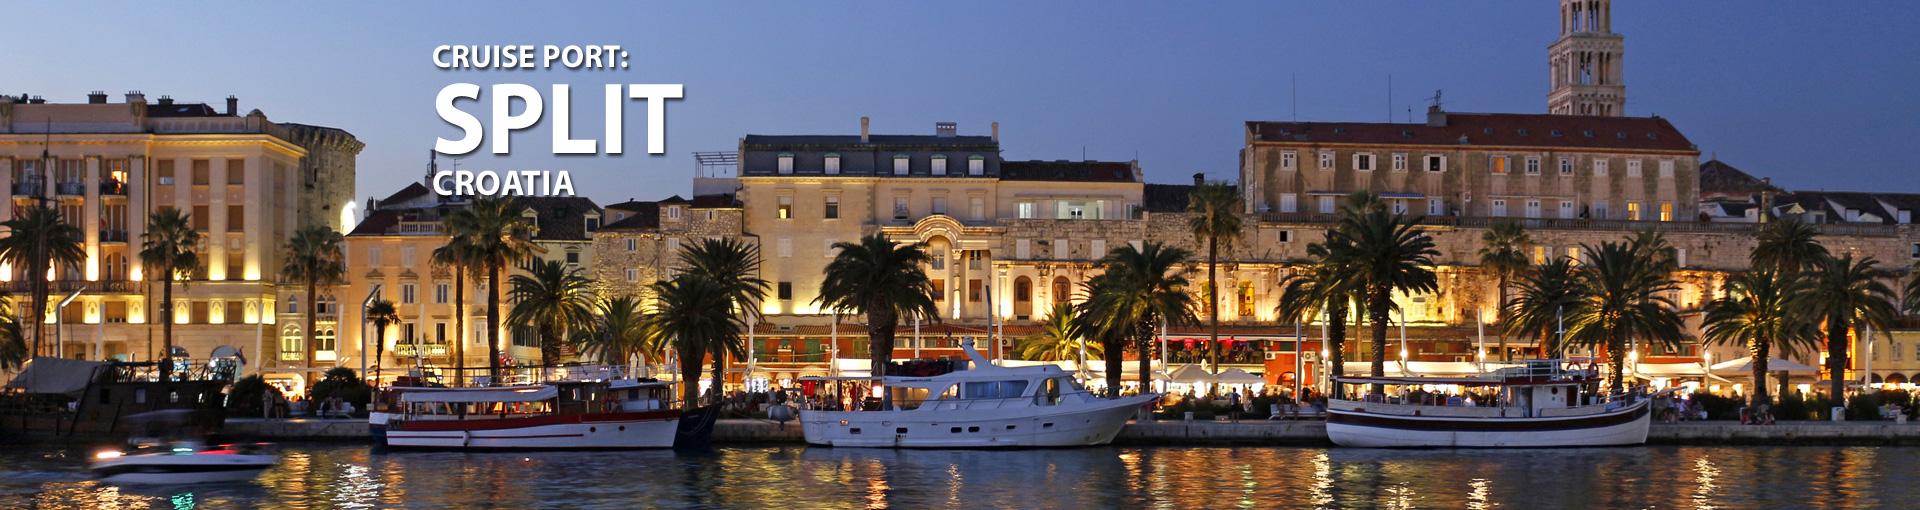 Cruises to Split, Croatia